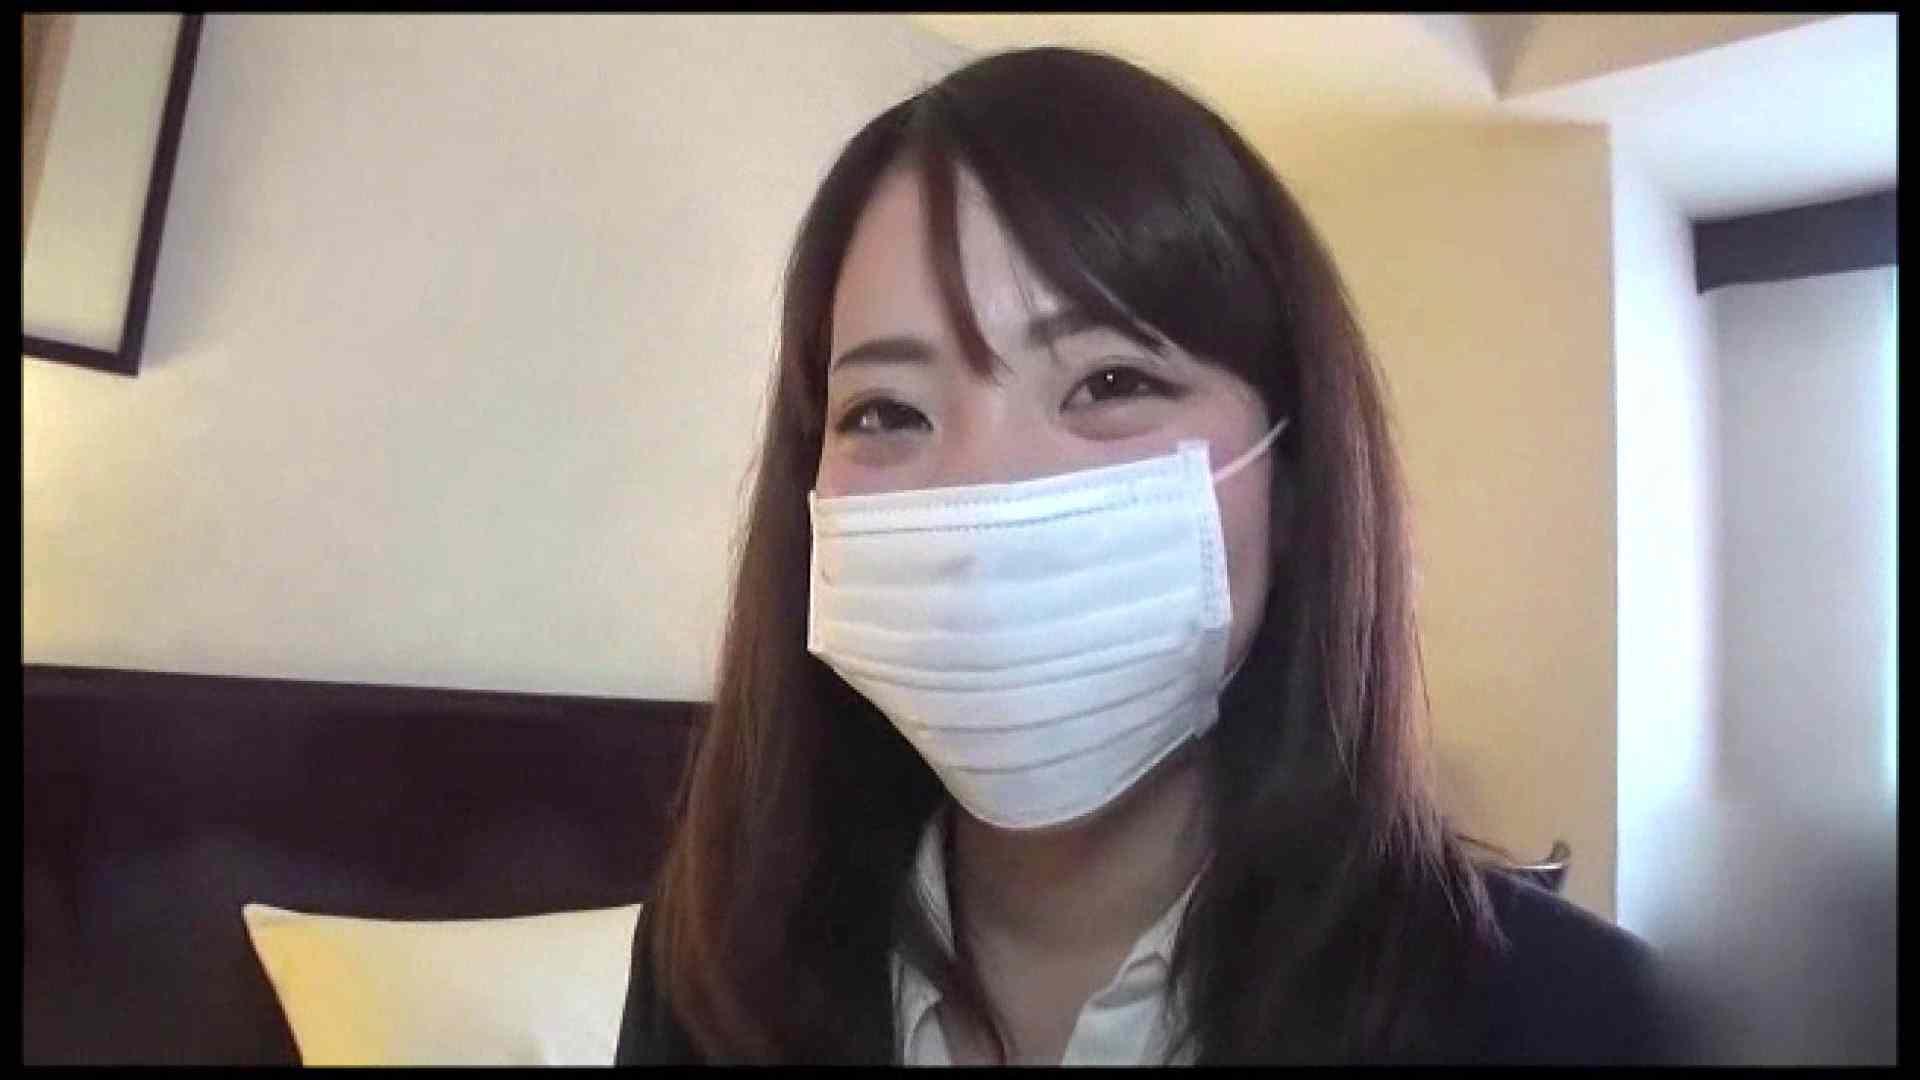 ハメ撮り天国 Vol.37 流出作品  55連発 2